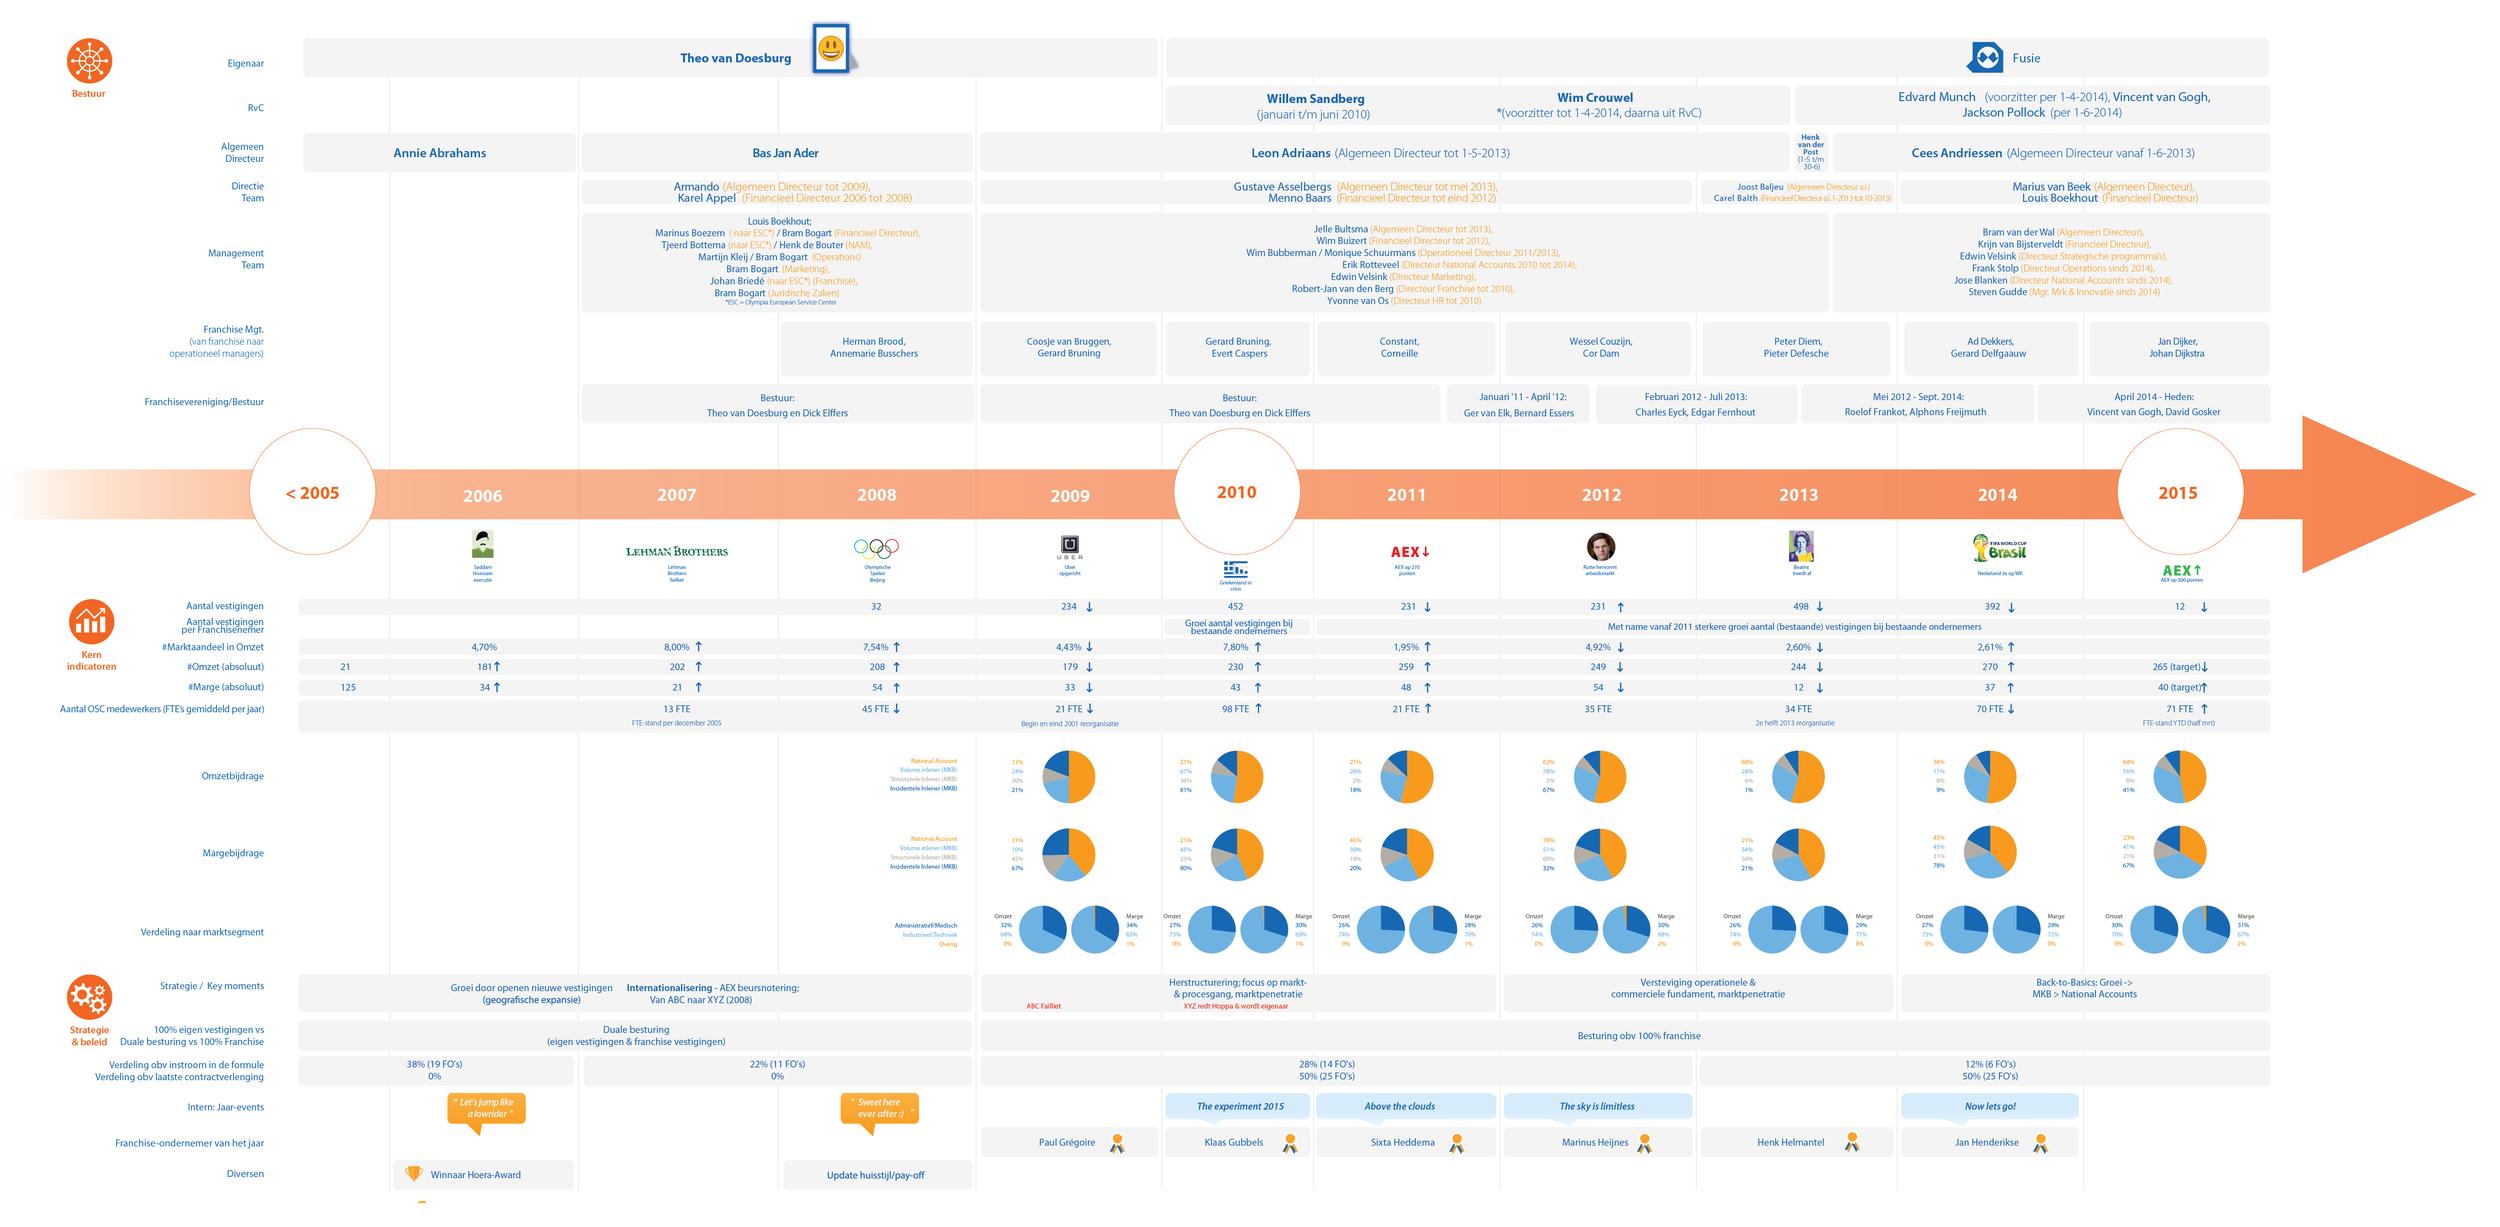 studio_sigmon_infographic_business